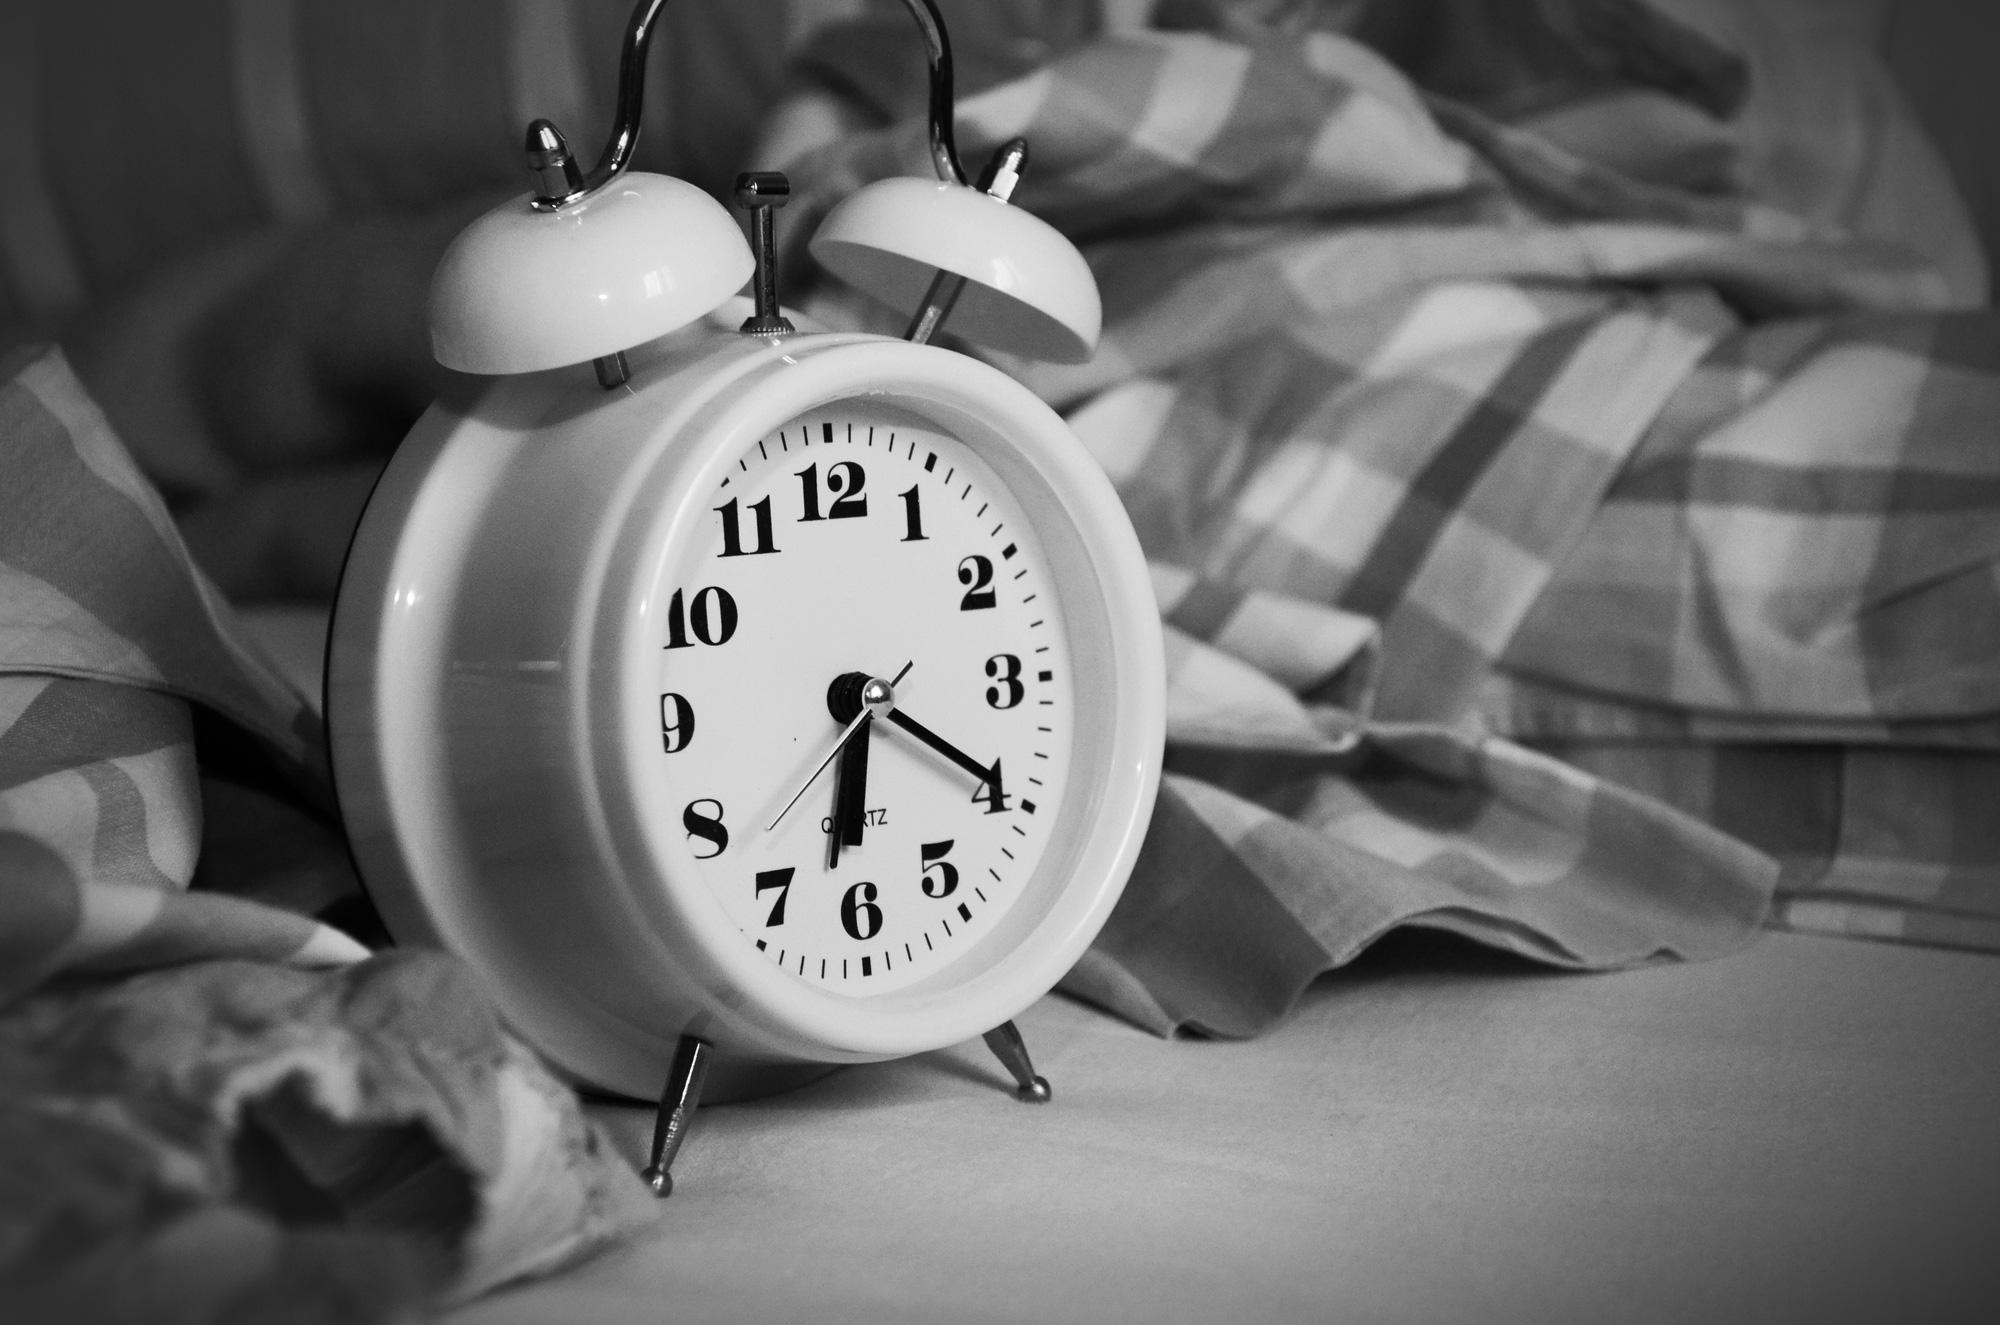 alarm-clock-analogue-bed-bedroom-271818